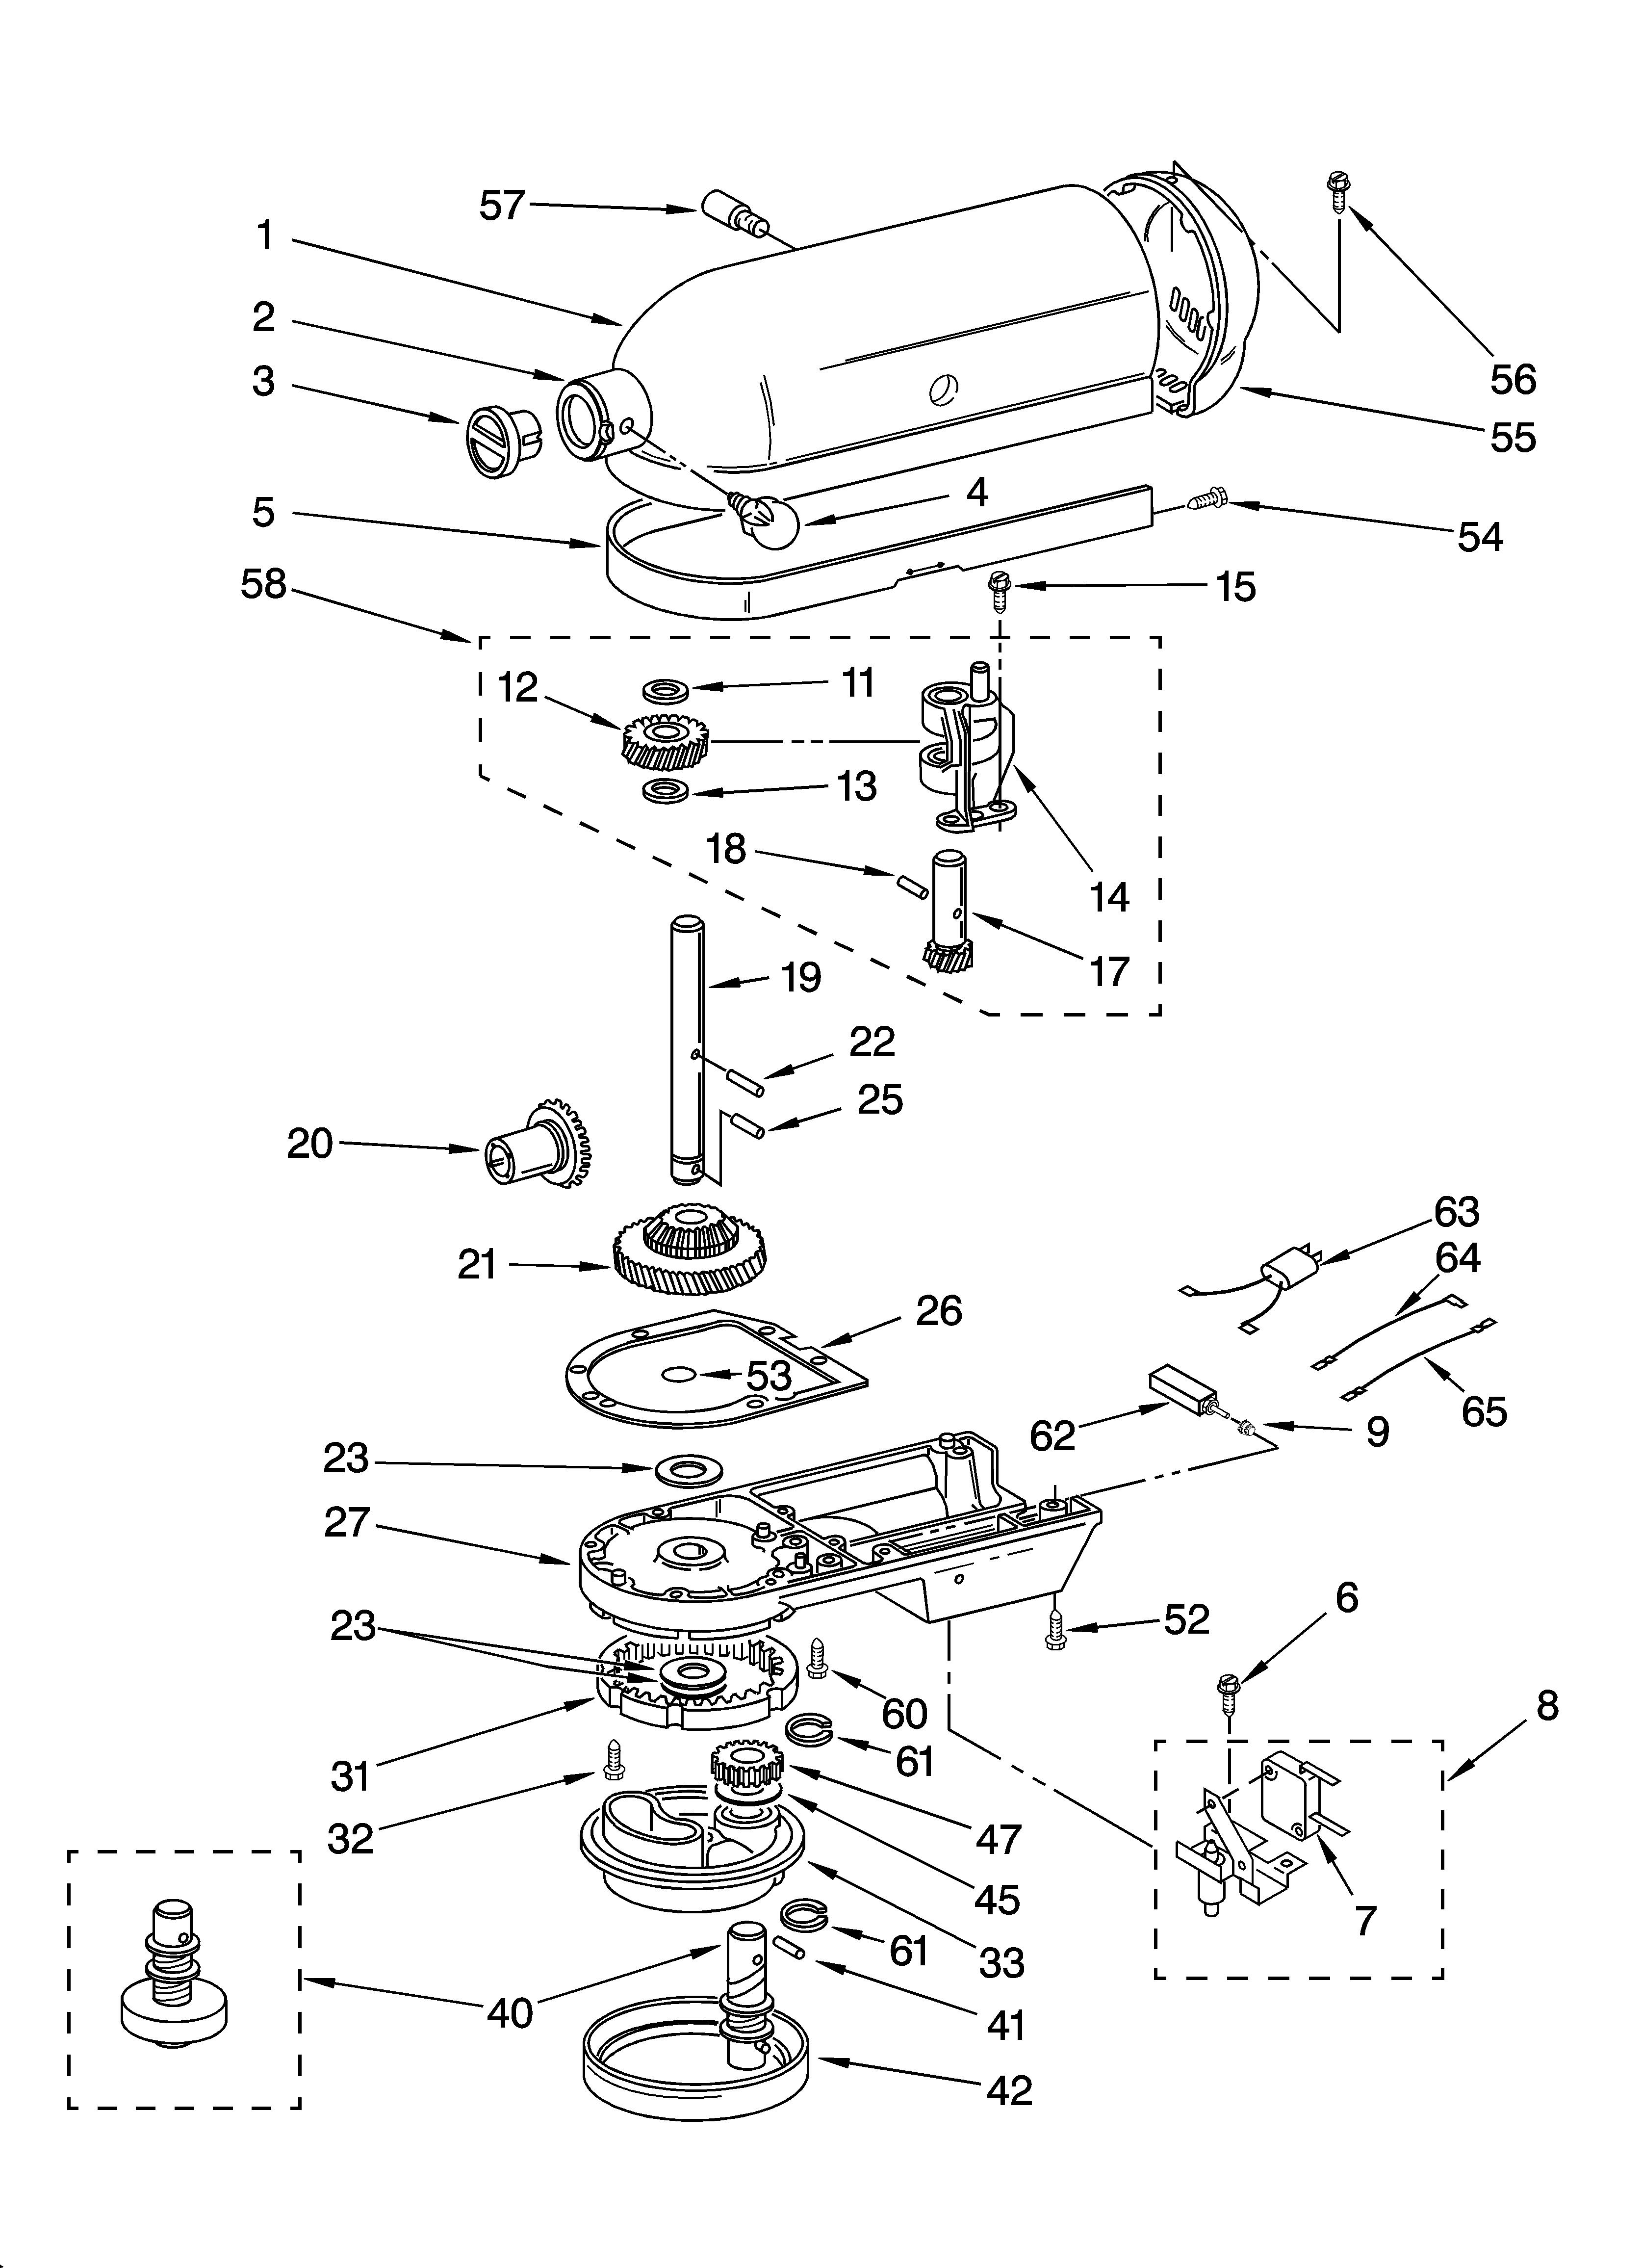 hight resolution of kitchen mixer wiring diagram